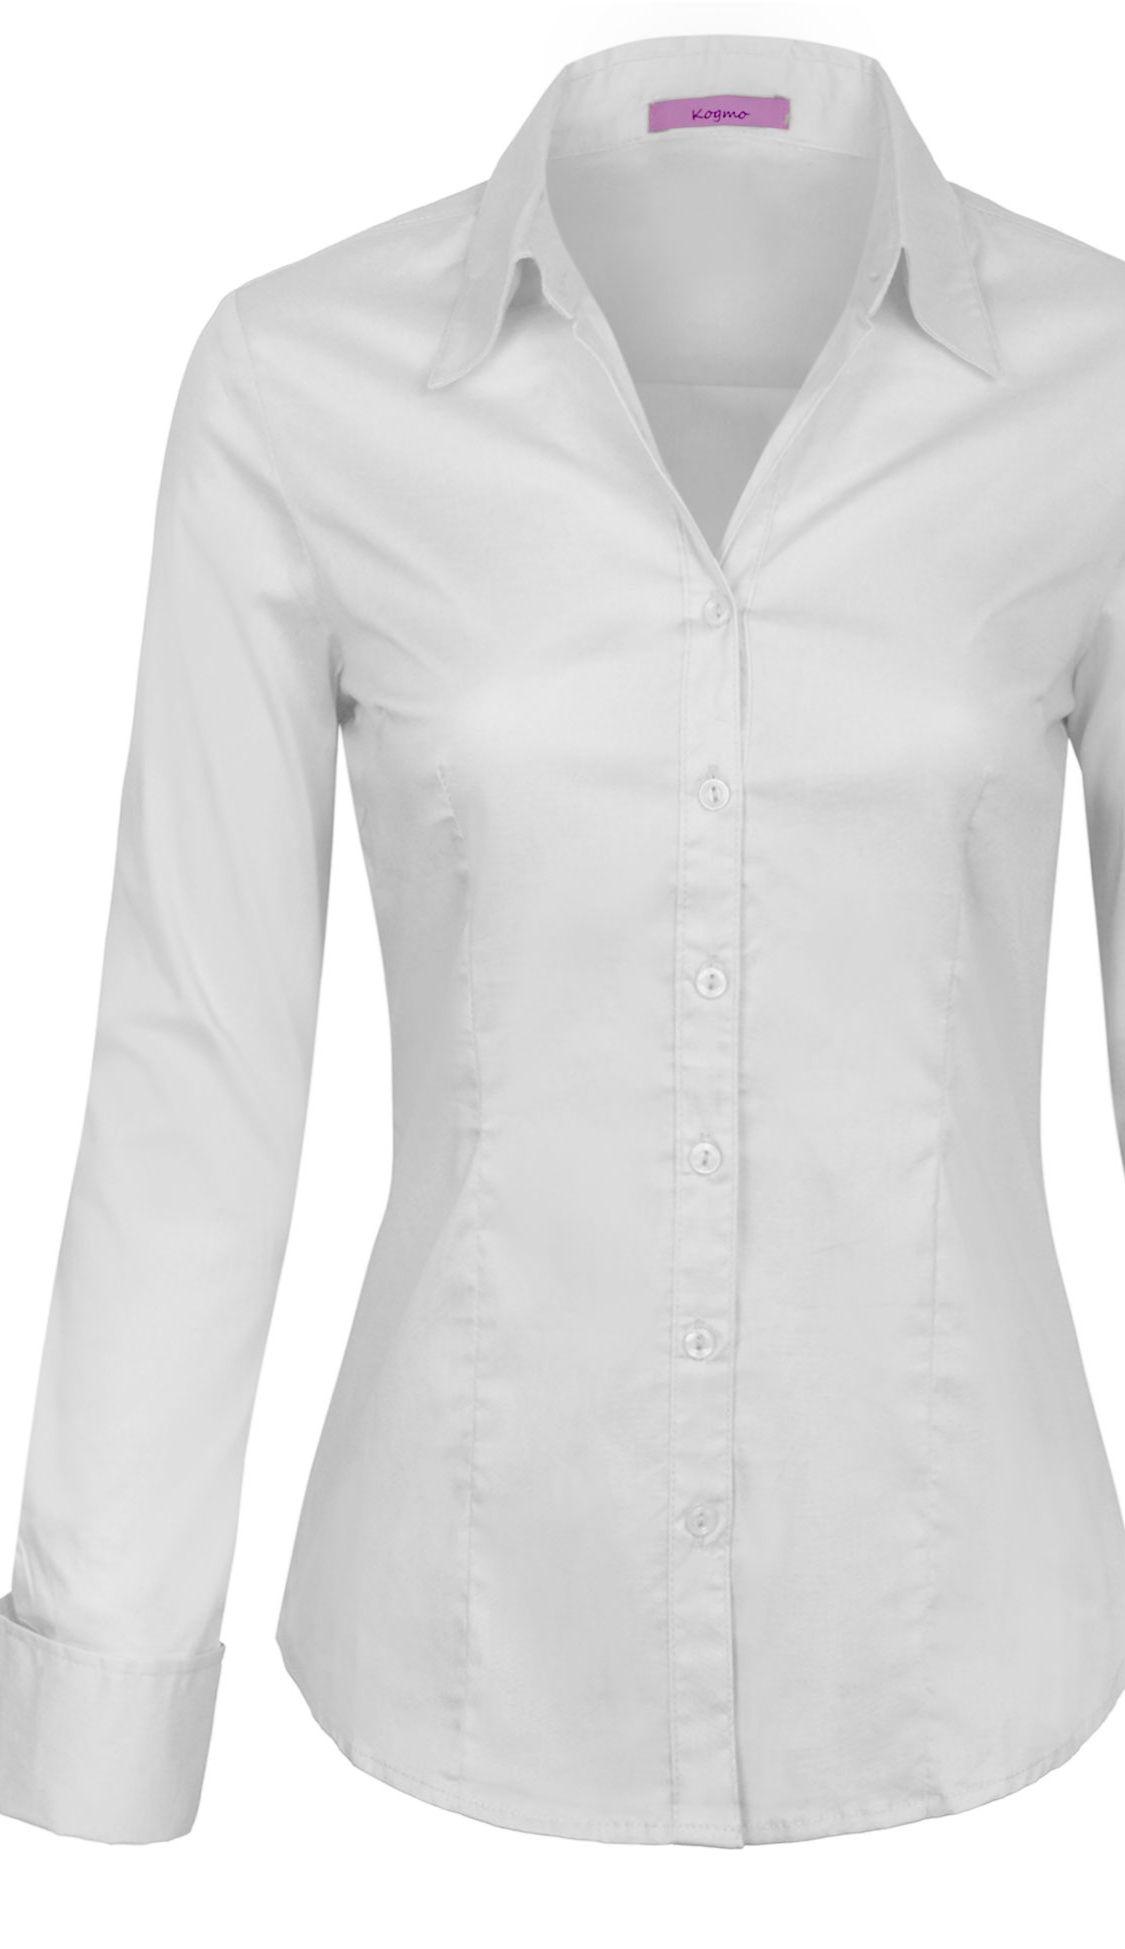 Kogmo Kogmo Womens Basic Long Sleeve Button Down Shirts Office Work Blouse S 3x Walmart Com Basic Long Sleeve Work Blouse Blouse S [ 1949 x 1125 Pixel ]